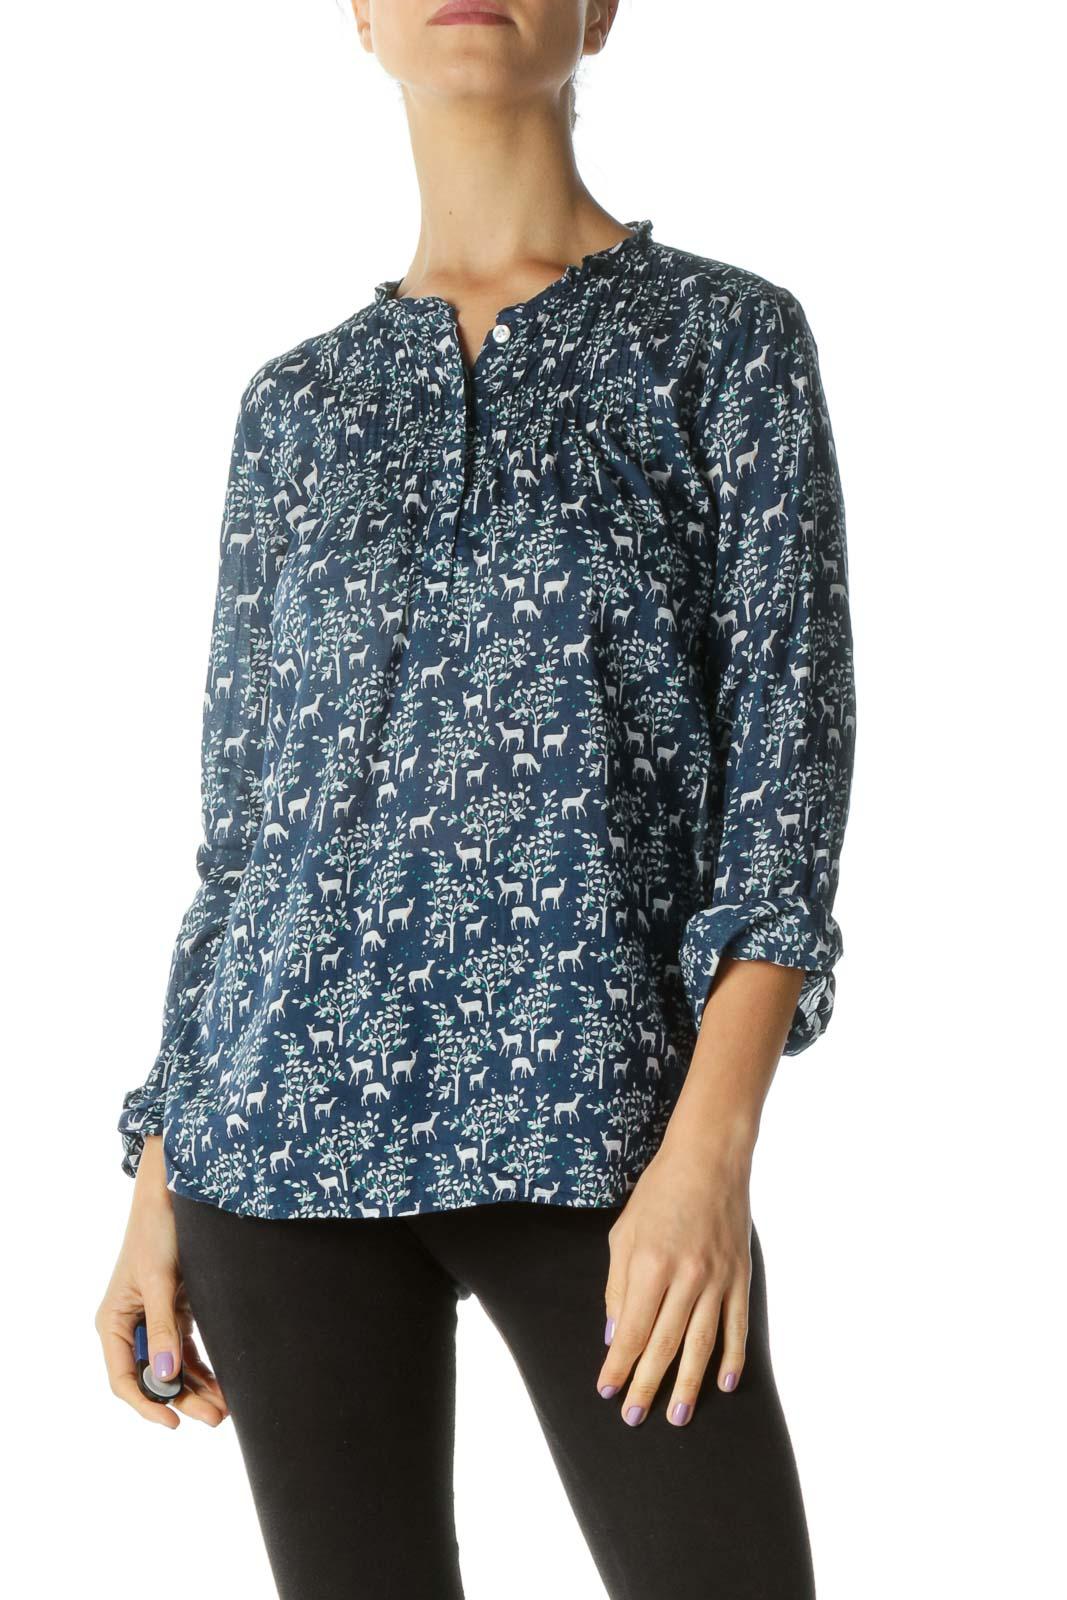 Blue White Deer Print V-Neck Buttoned Shirt